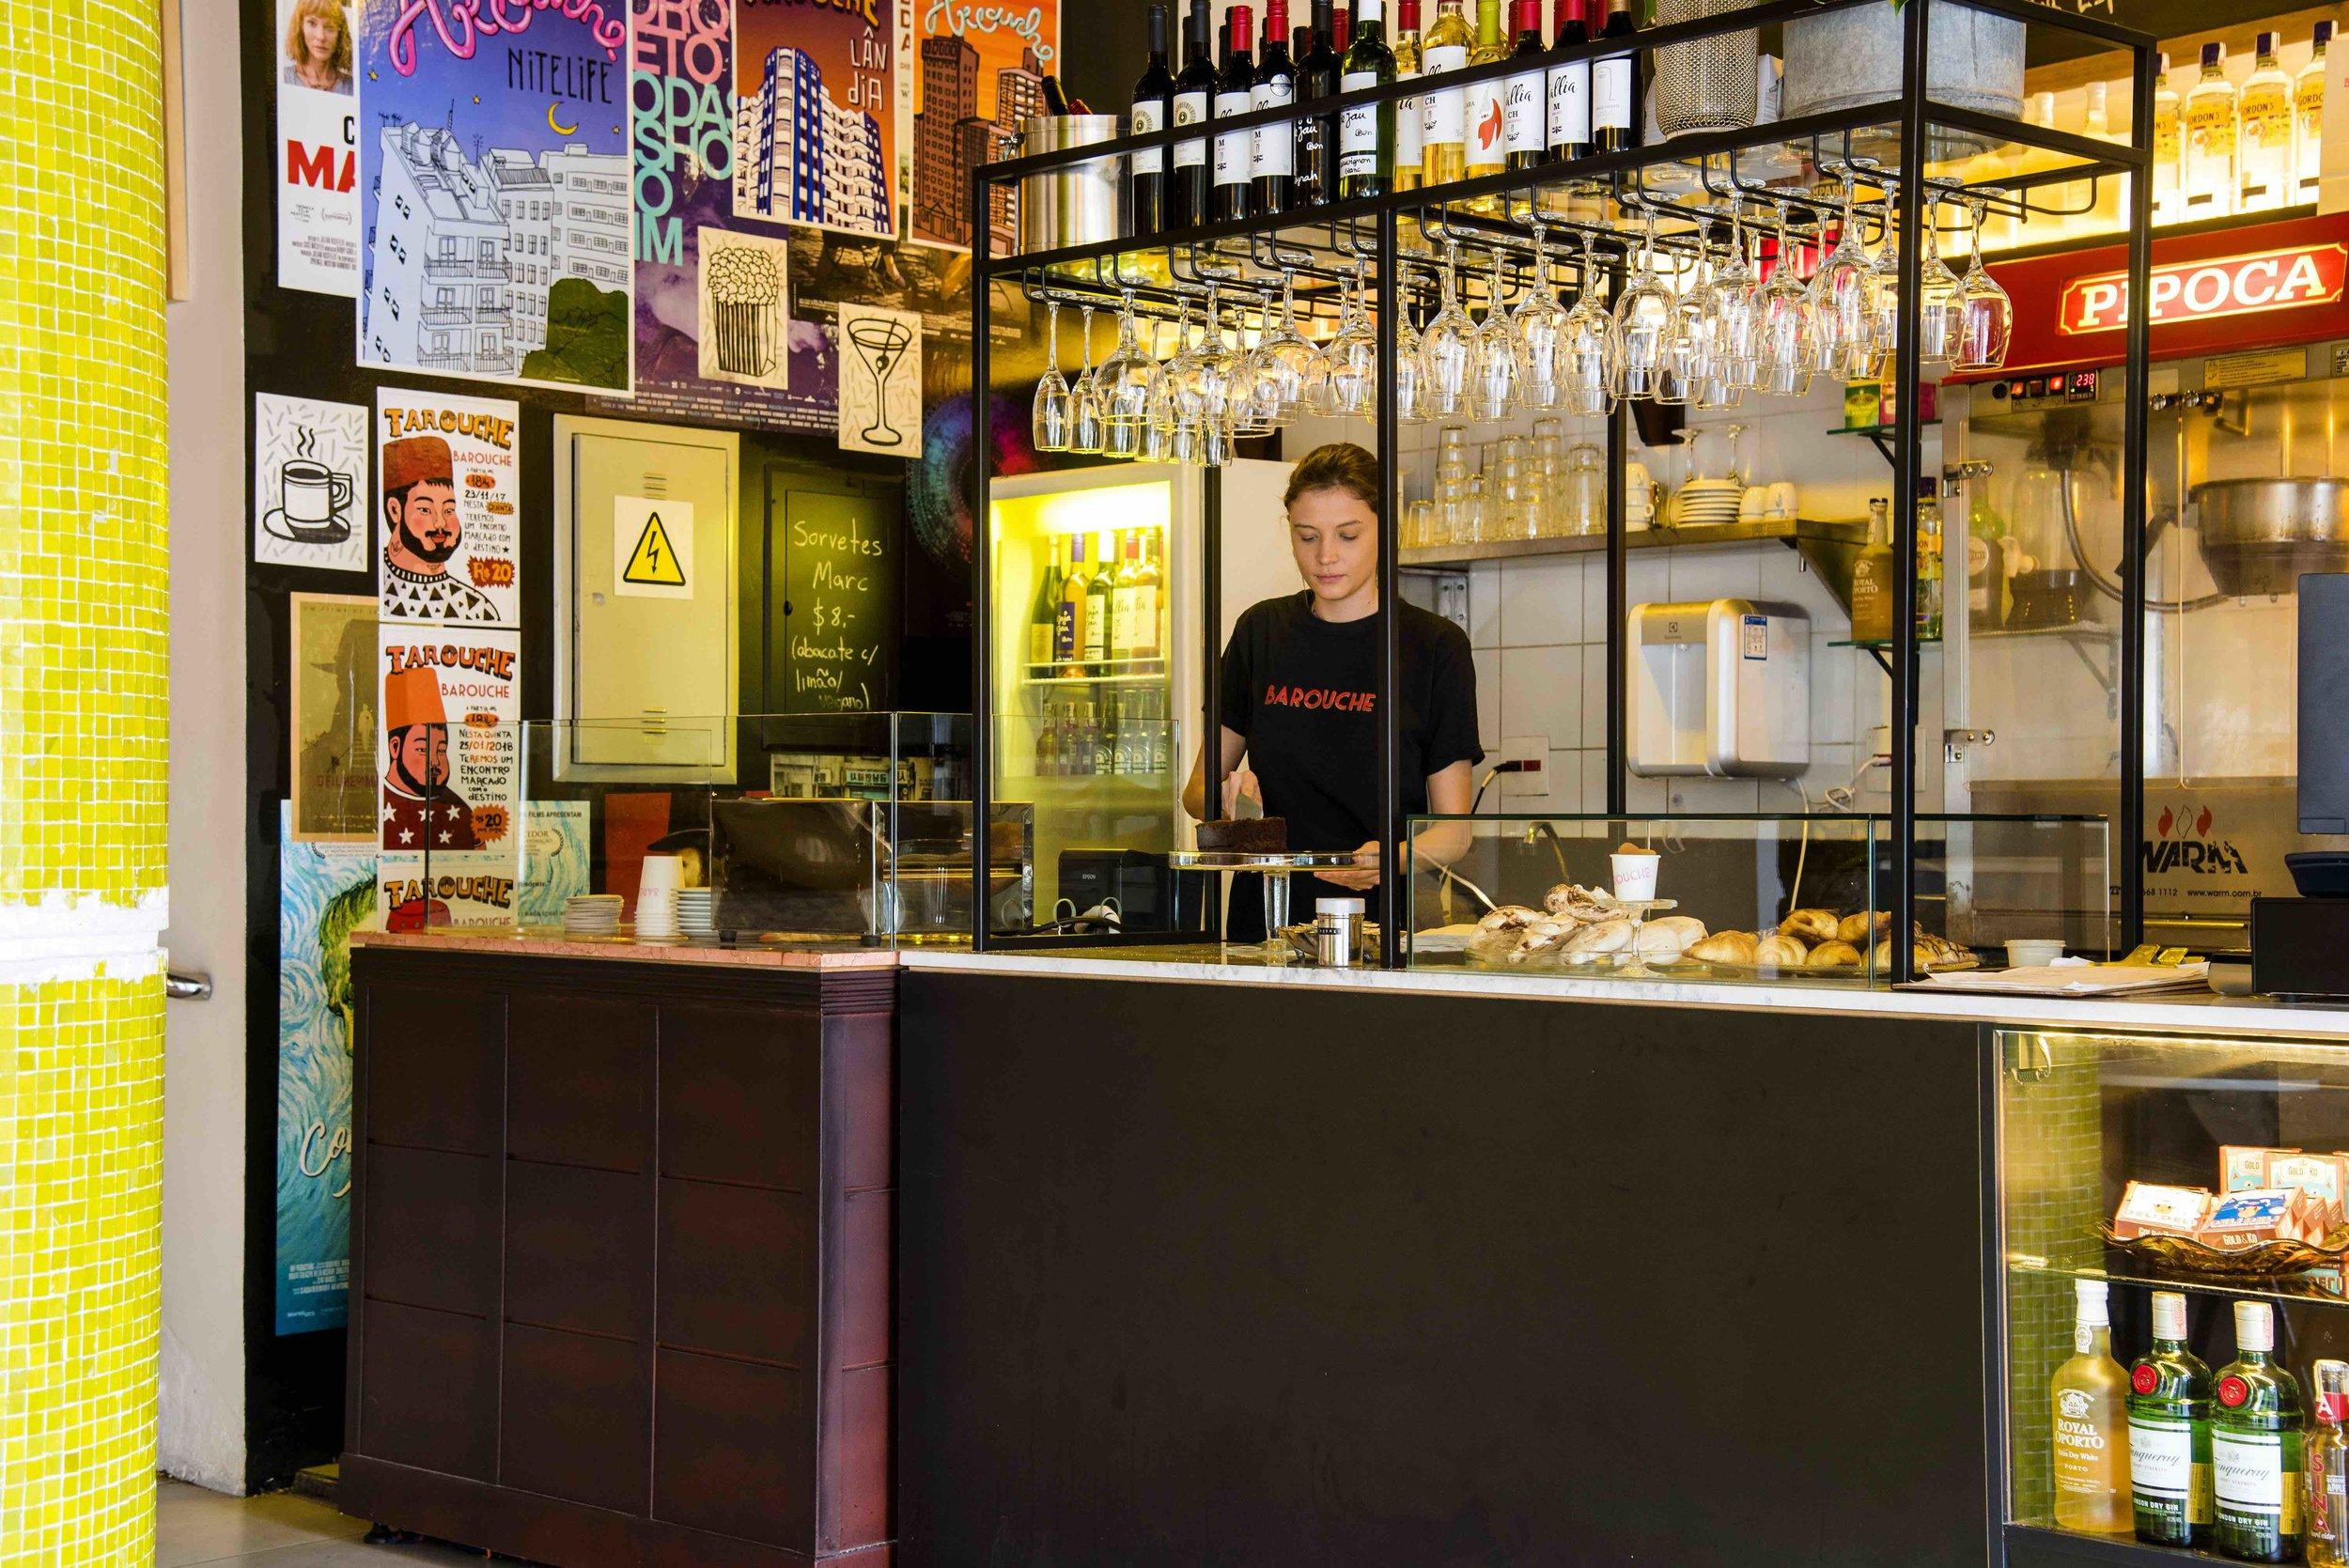 Barouche, bar instalado dentro do cinema.  Foto de Ligia Skowronski.